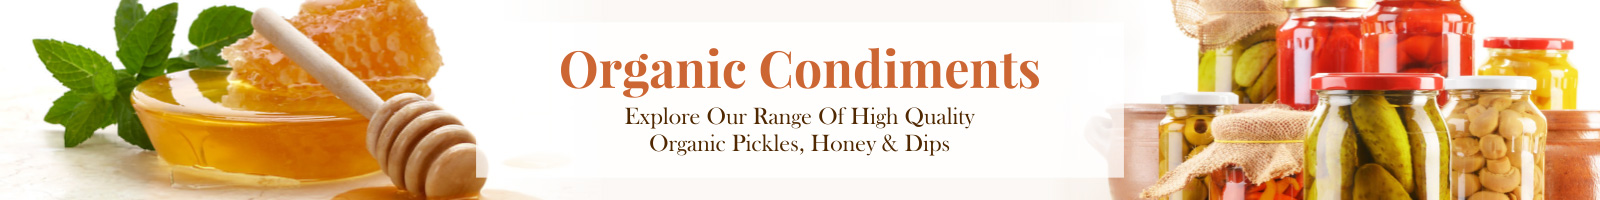 Organic Condiments